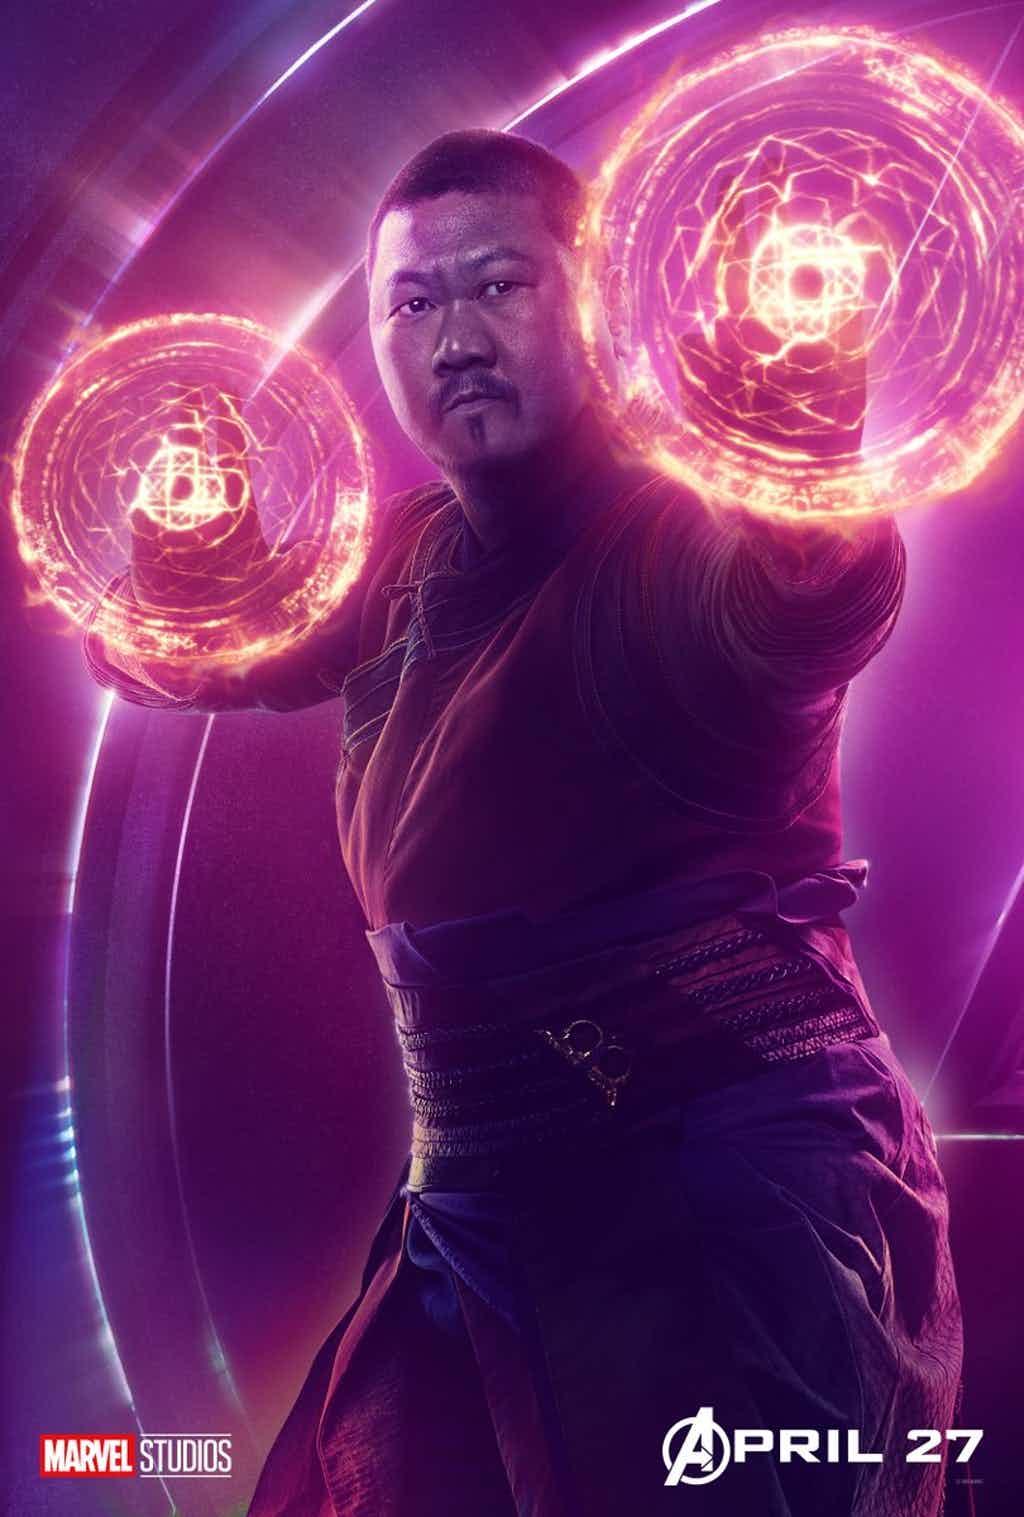 szmk_marvel_infinity_war_vegtelen_haboru_bosszuallok_avengers_ironman_hulk_thor_captainamaerica_guardians_galaxy_21.jpg